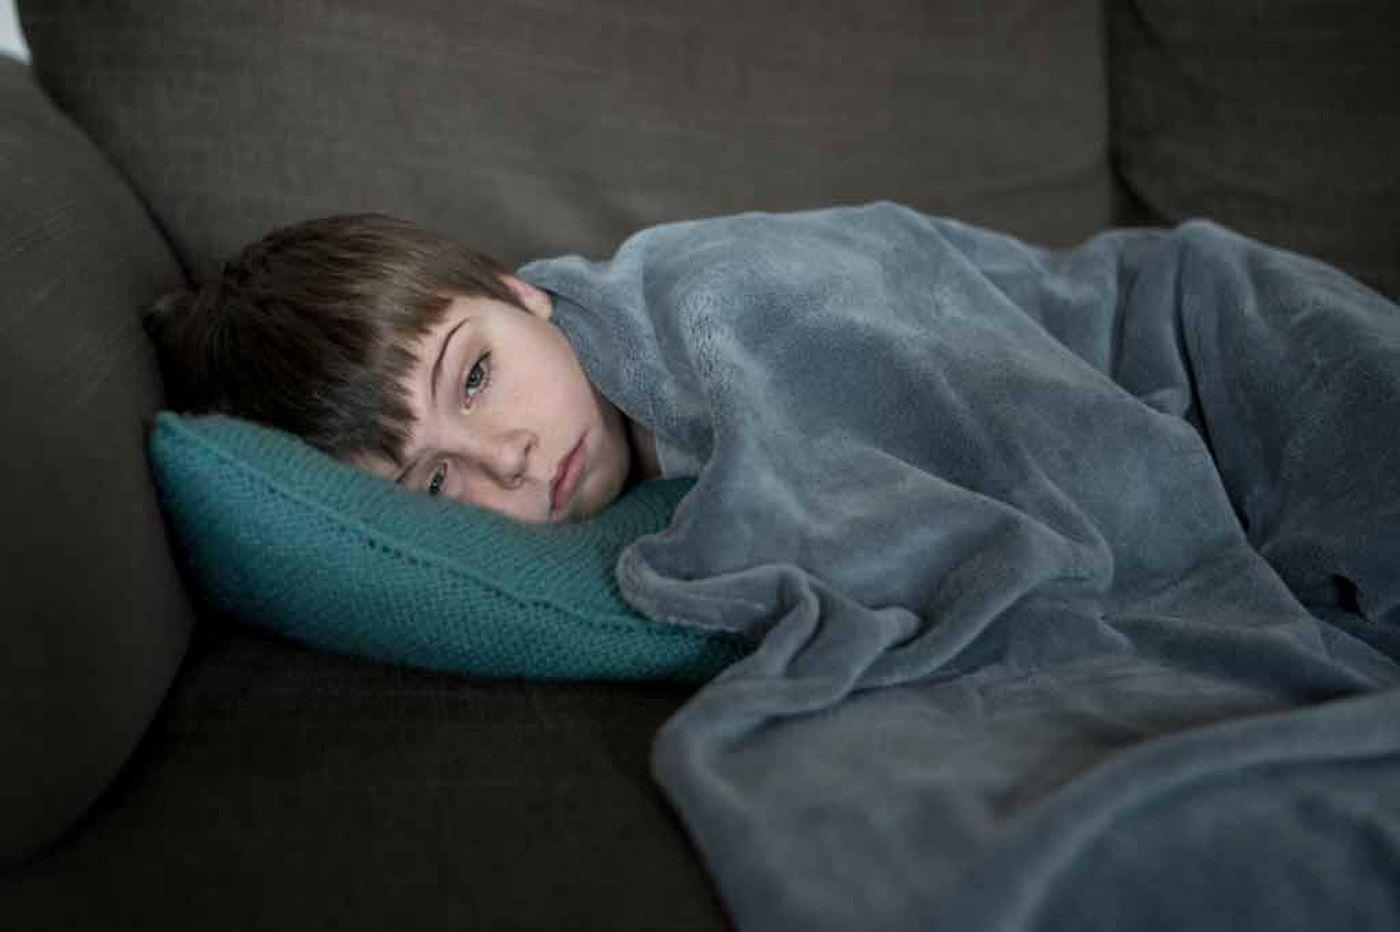 On coping with pediatric illness